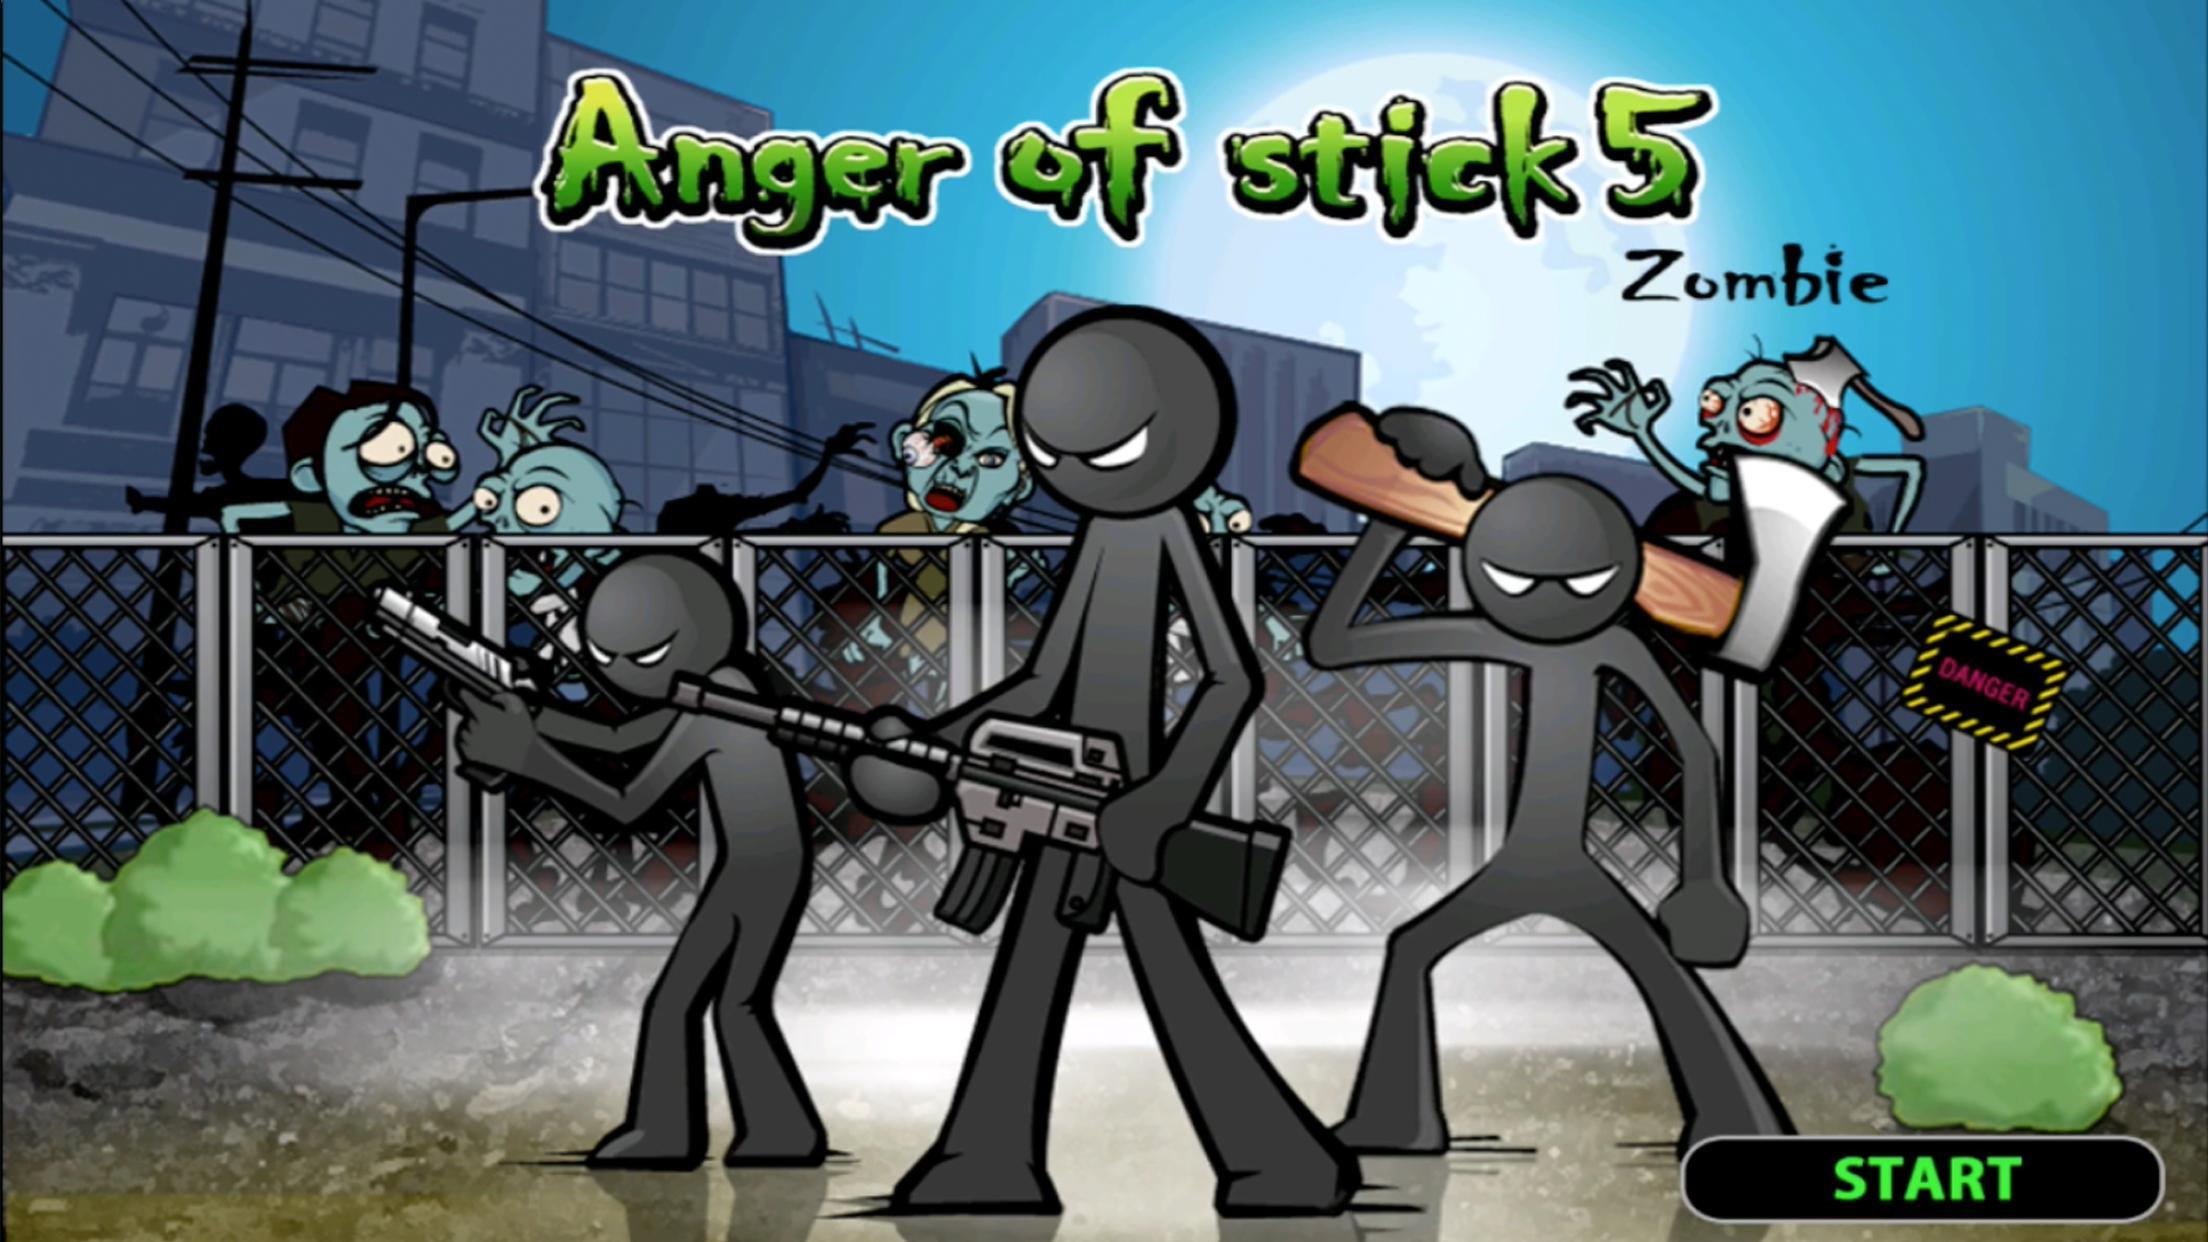 Anger of stick 5 : zombie 1.1.33 Screenshot 13